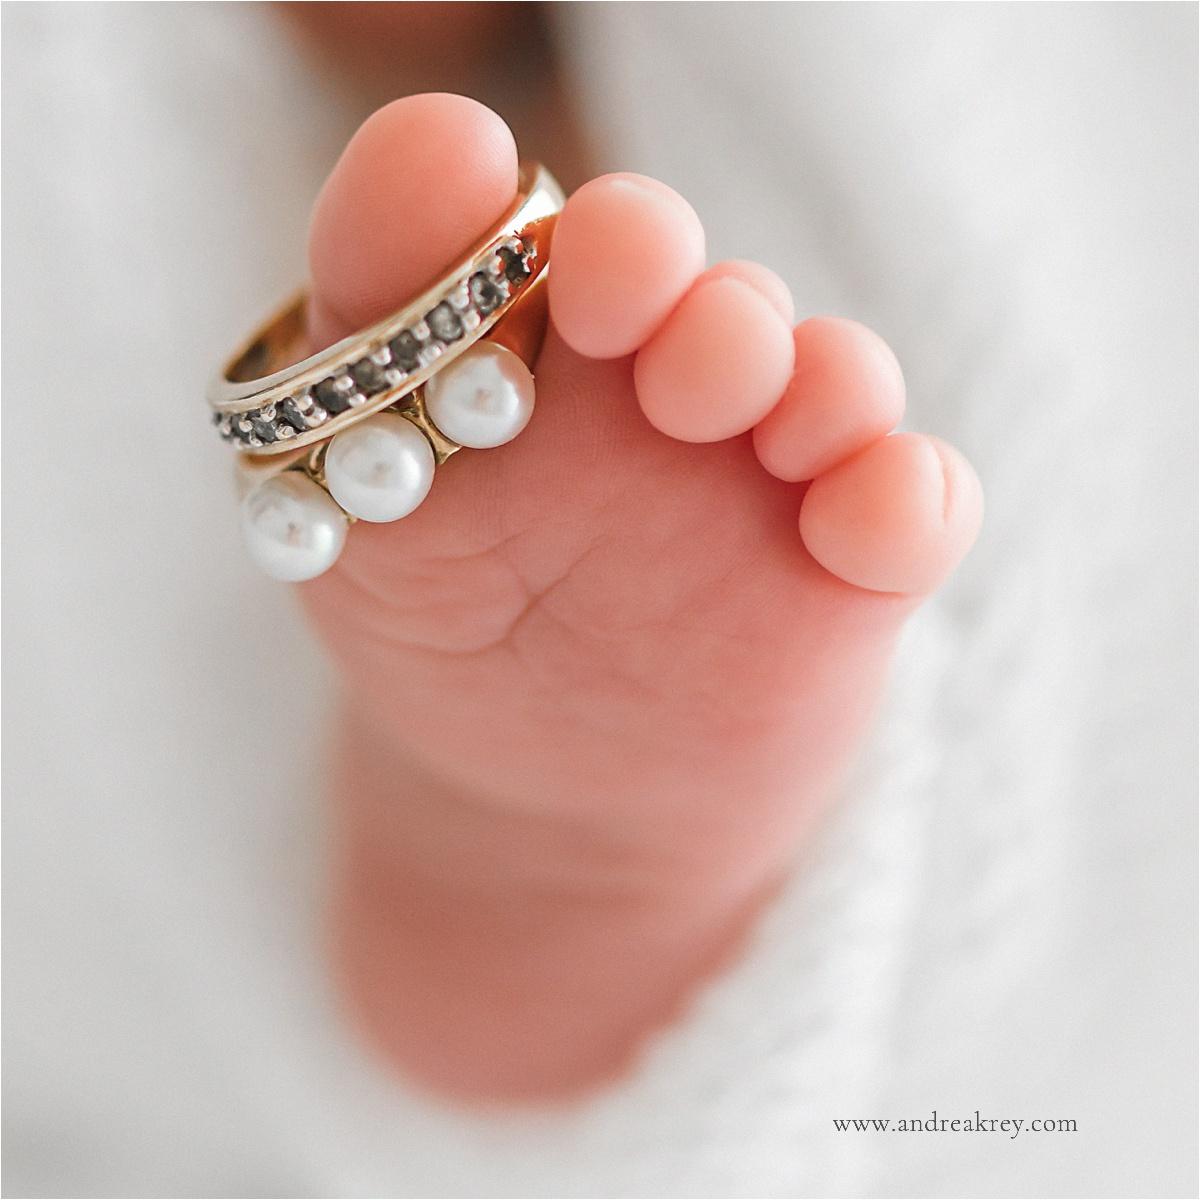 newborn-family-photography-session-savannah-richmond-hill-pooler-hinesville-georgia-andrea0krey-photography23.jpg